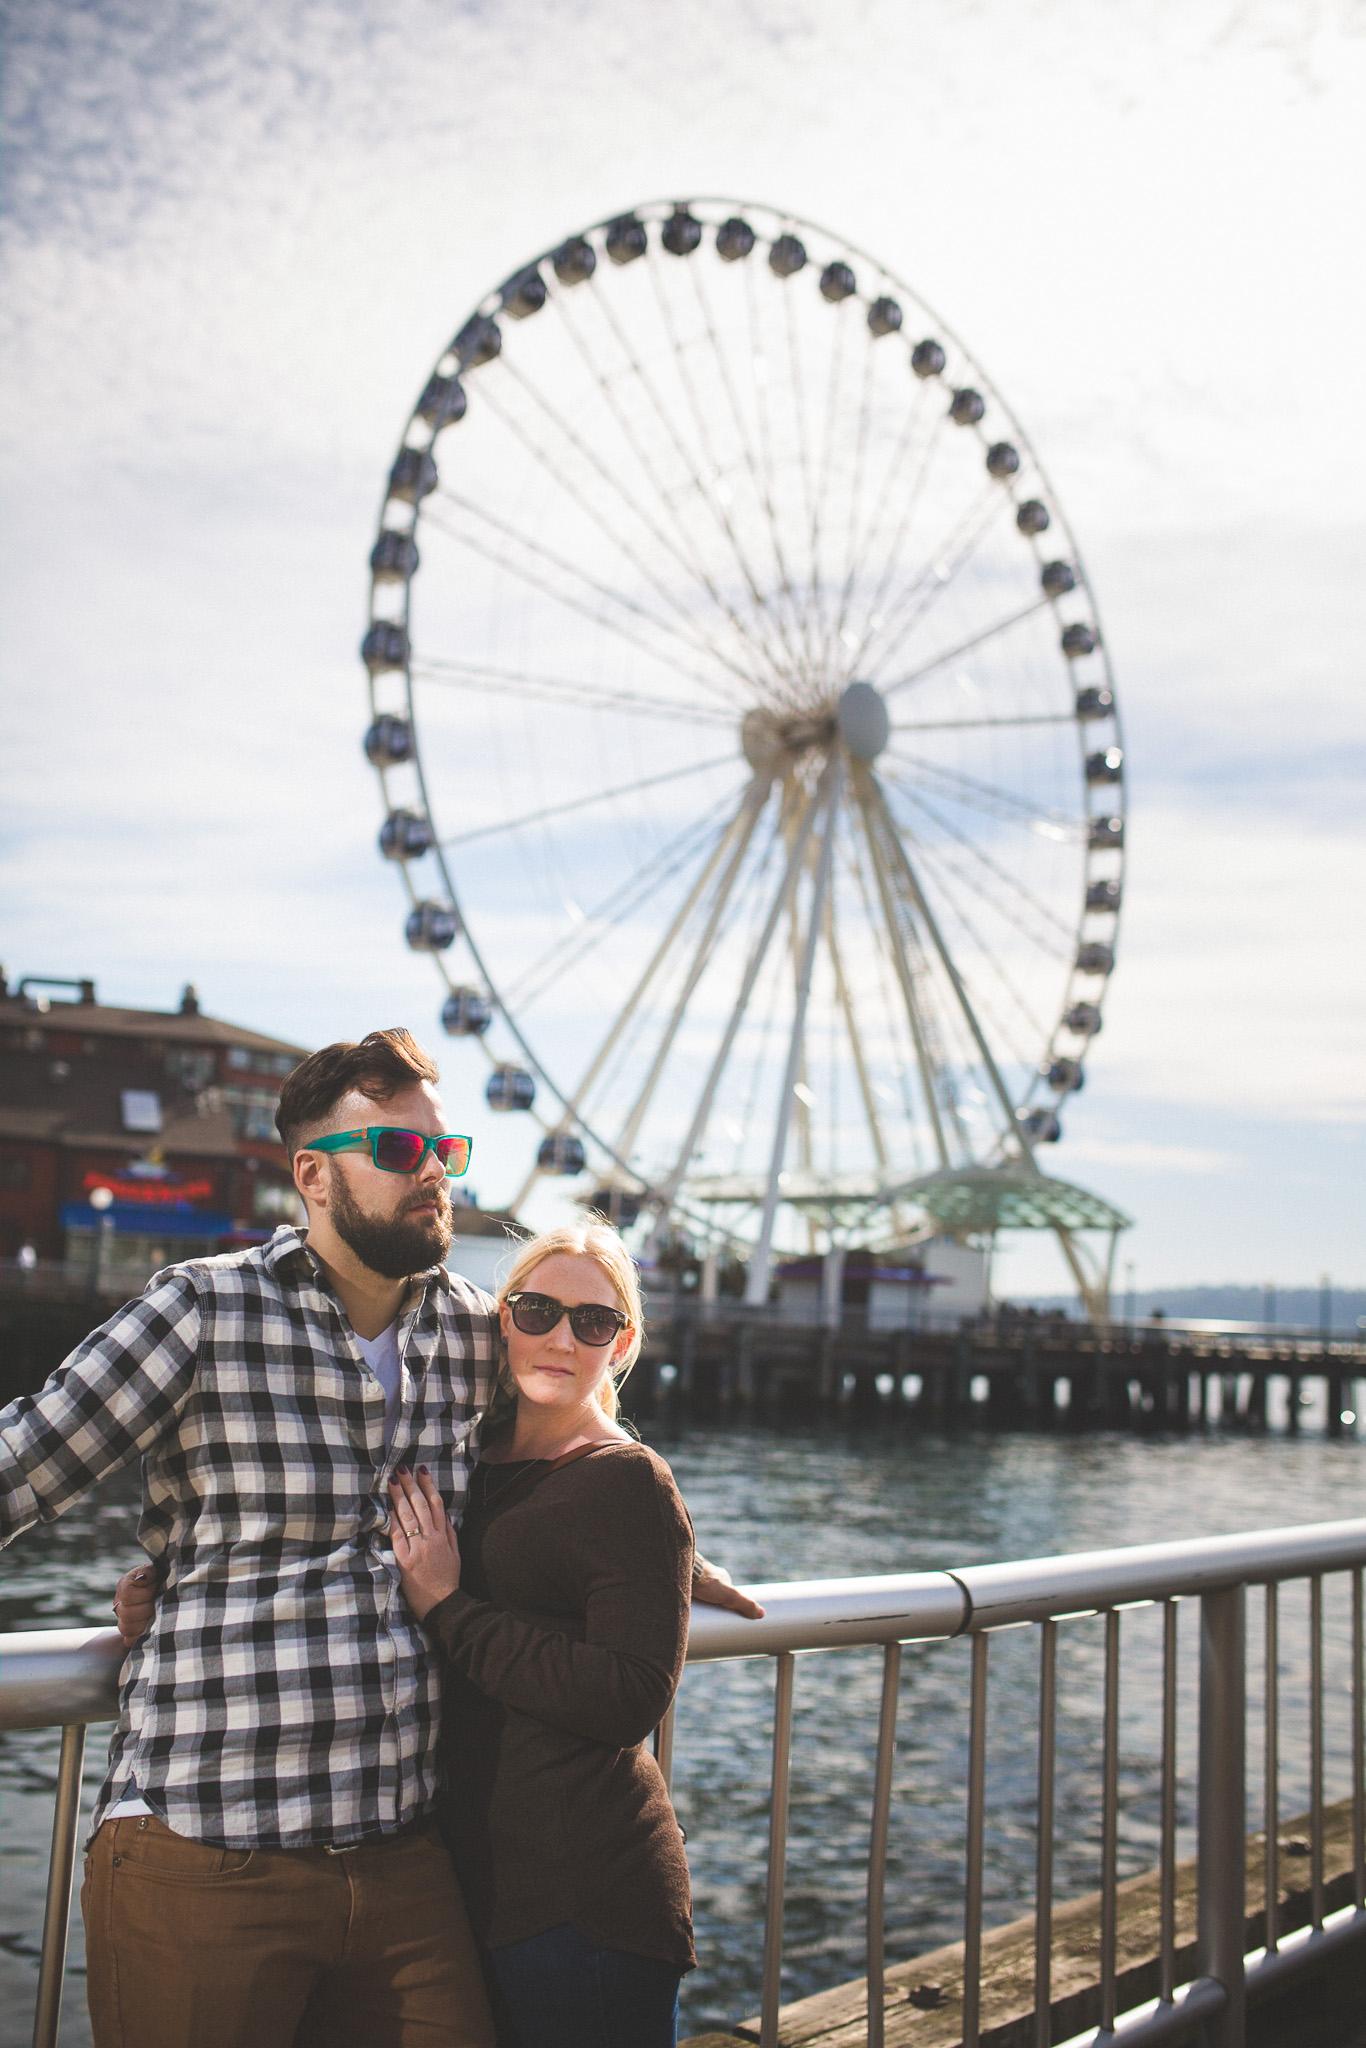 couple-in-front-of-ferris-wheel